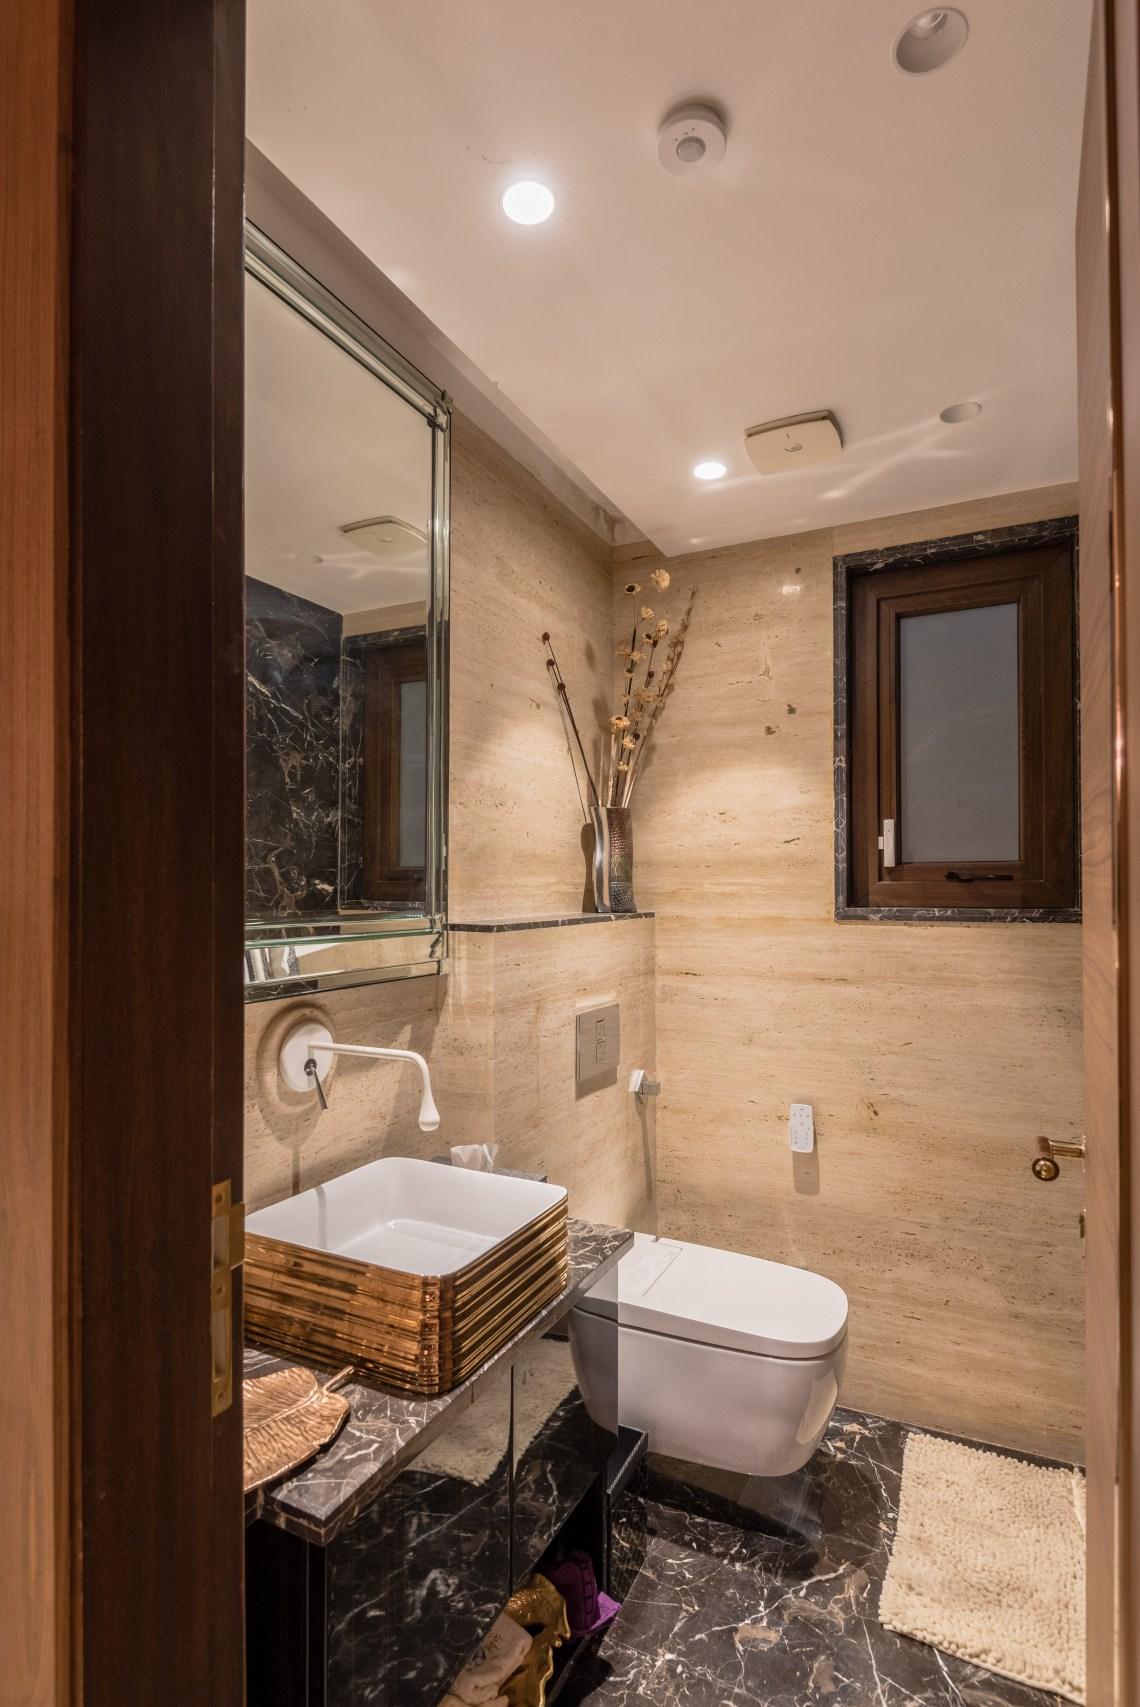 Bathroom Design: Experts revel ways to design this space ...